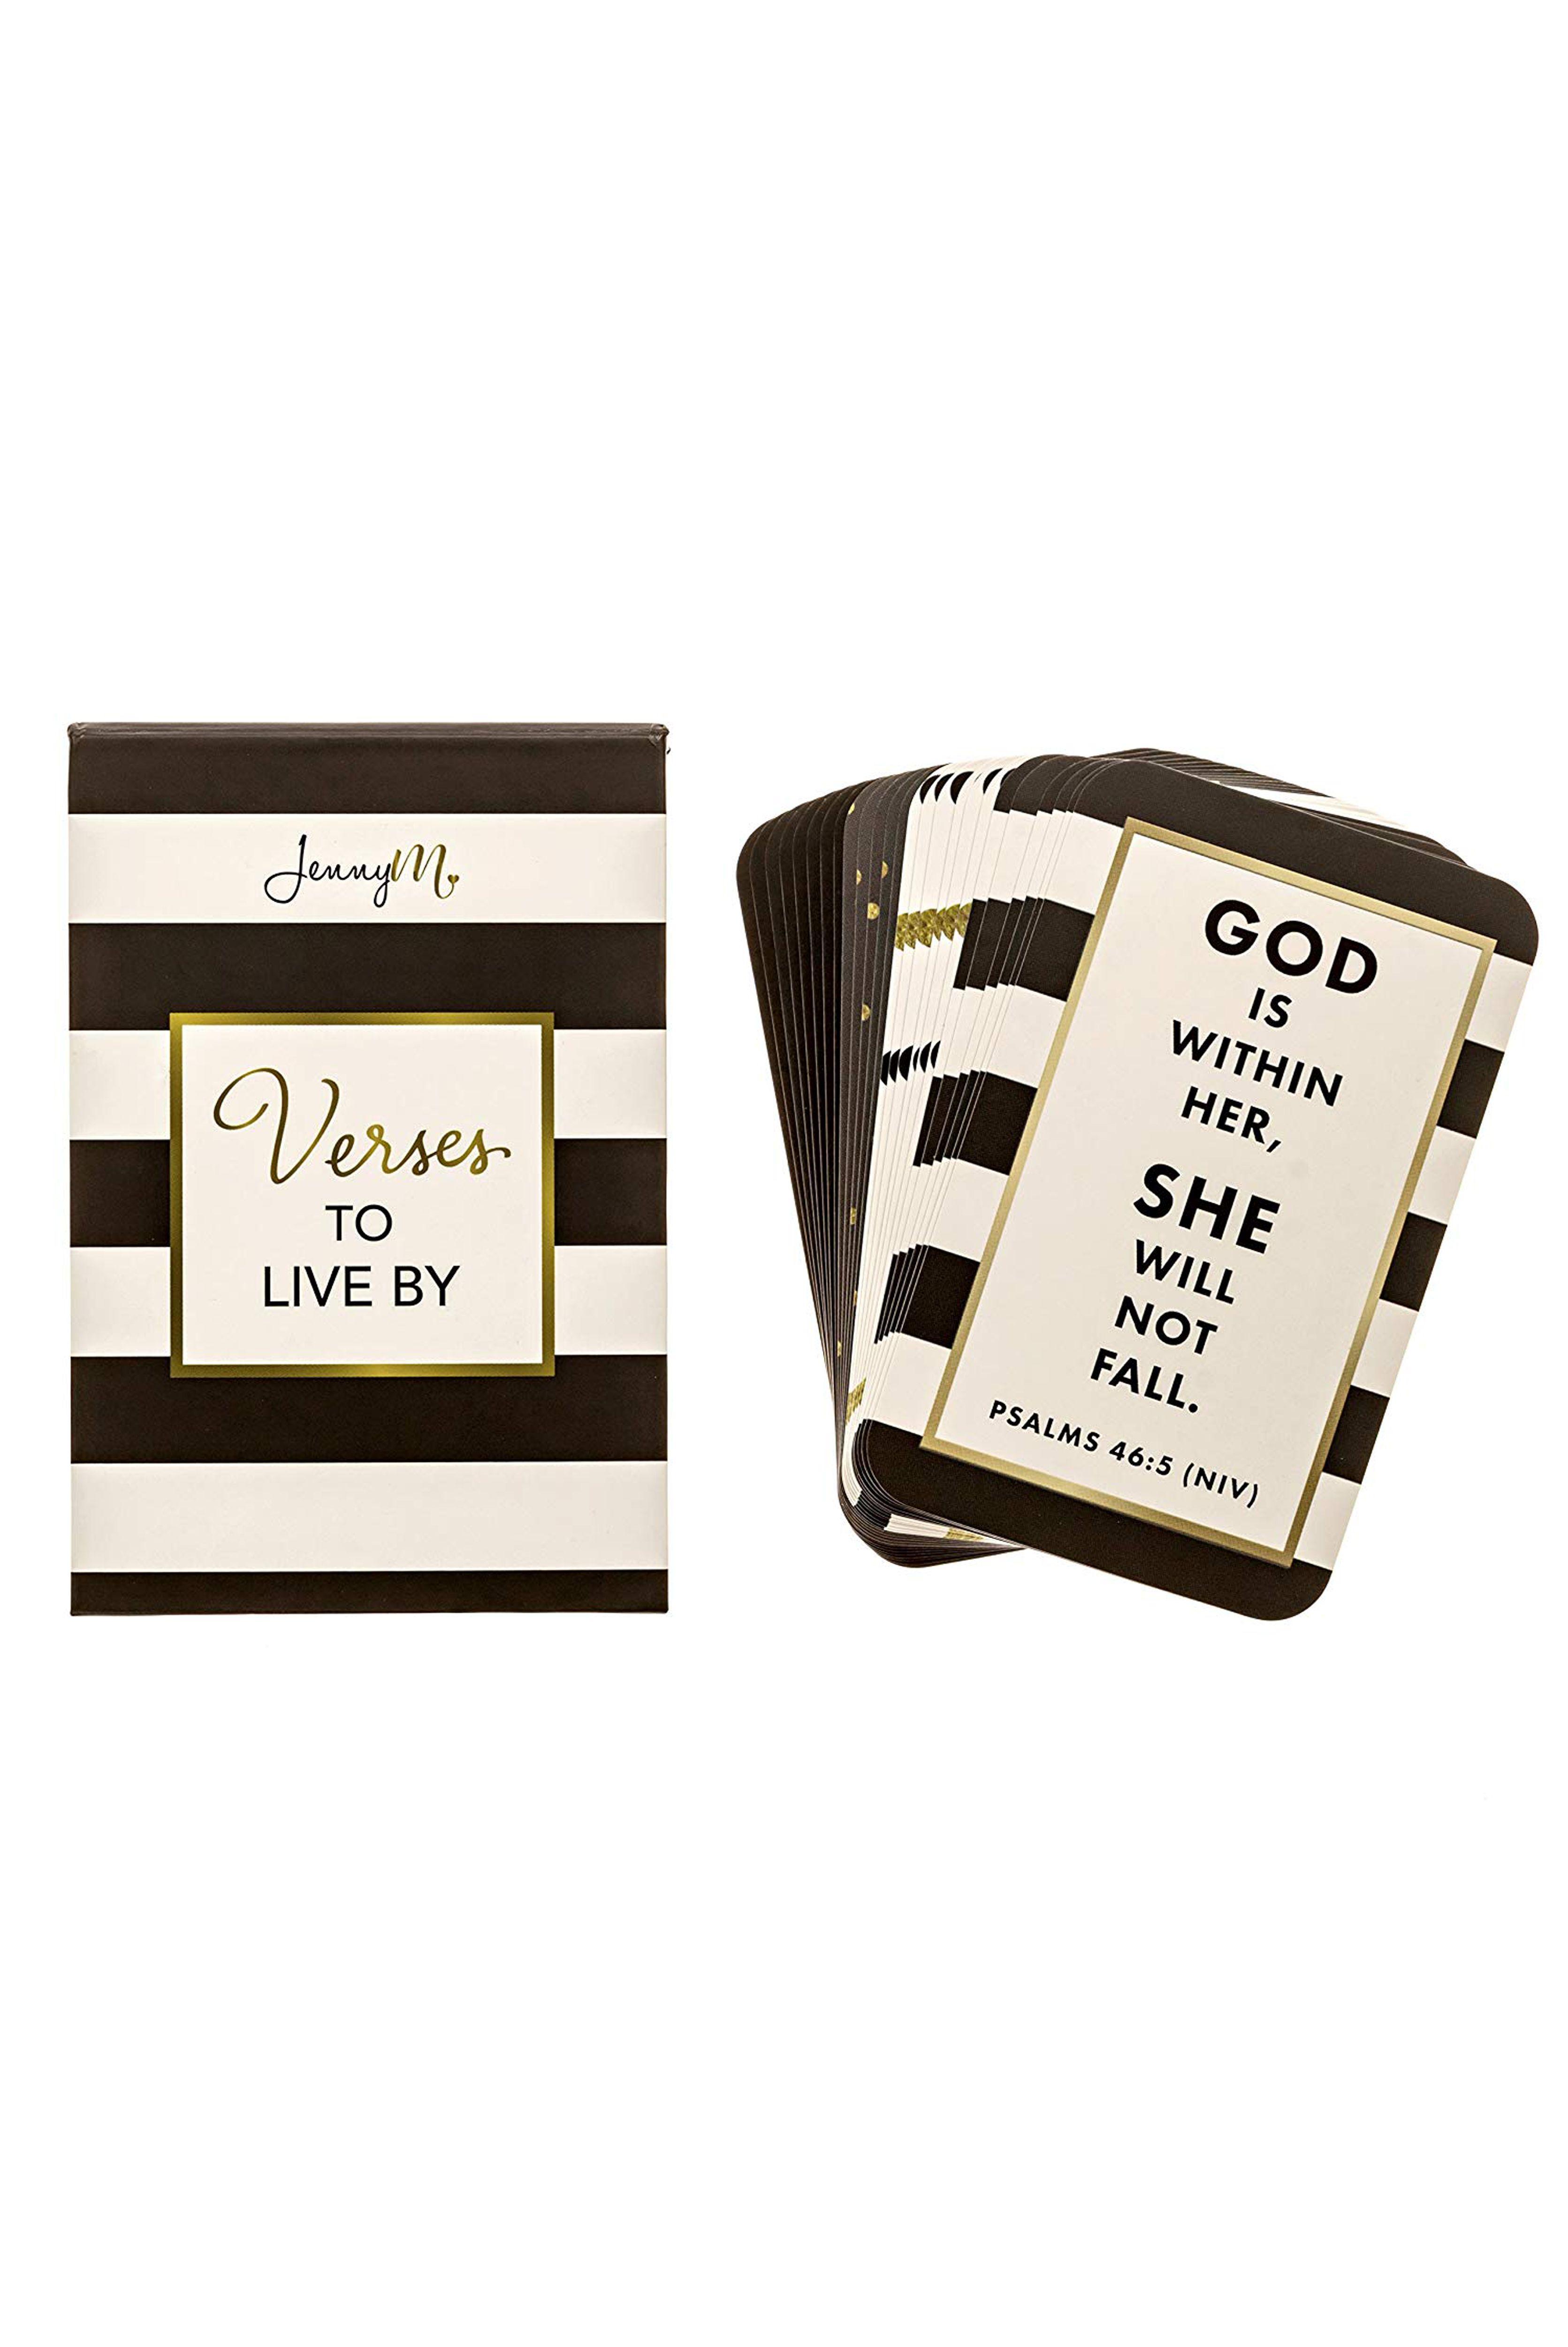 21 Christian Gifts for Women - Fun & Lovely Faith-Based Gift Ideas